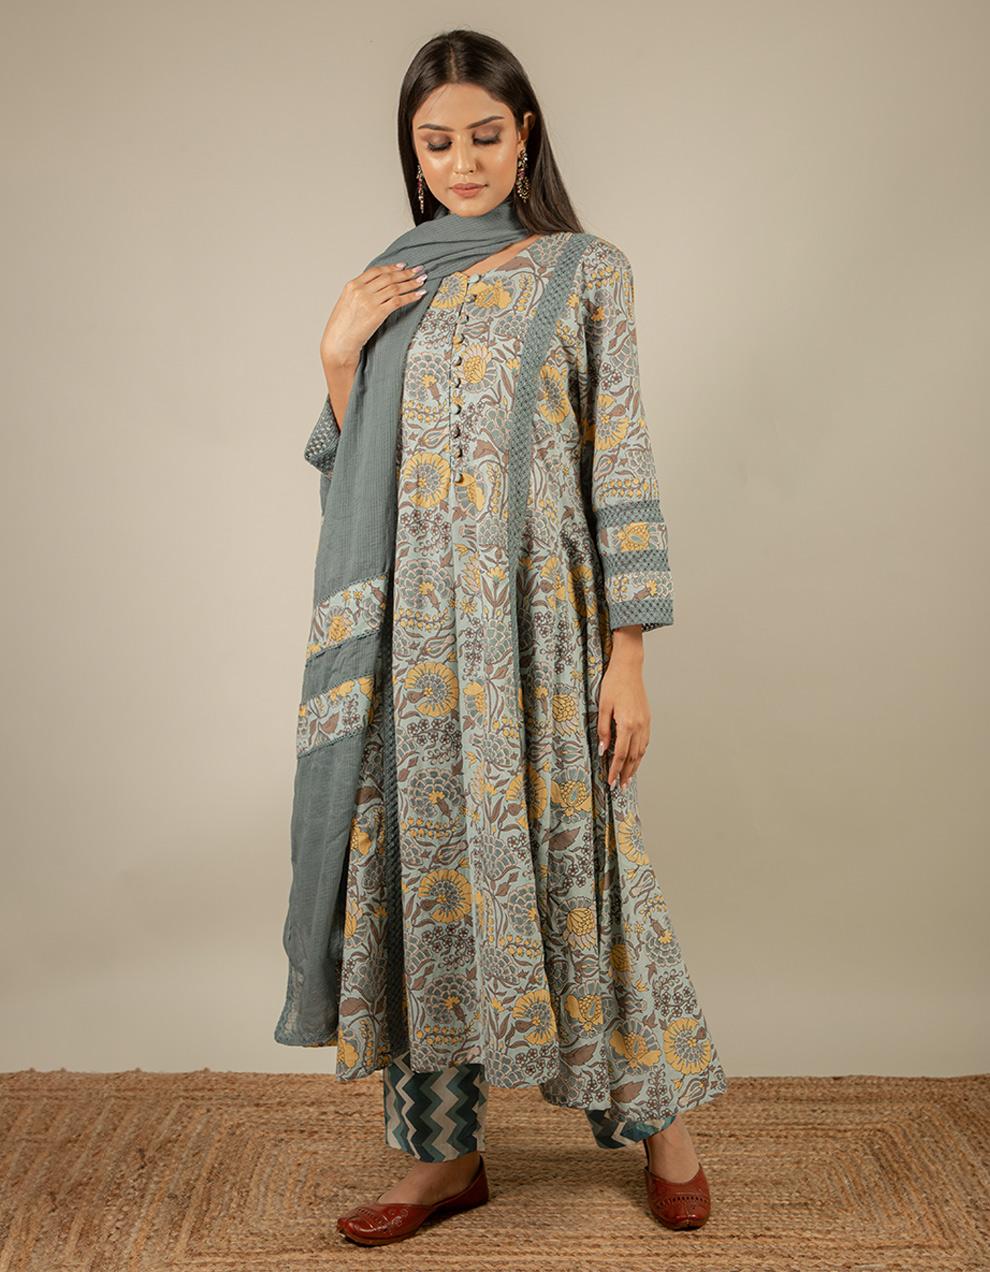 cotton kurta with pants and dupatta